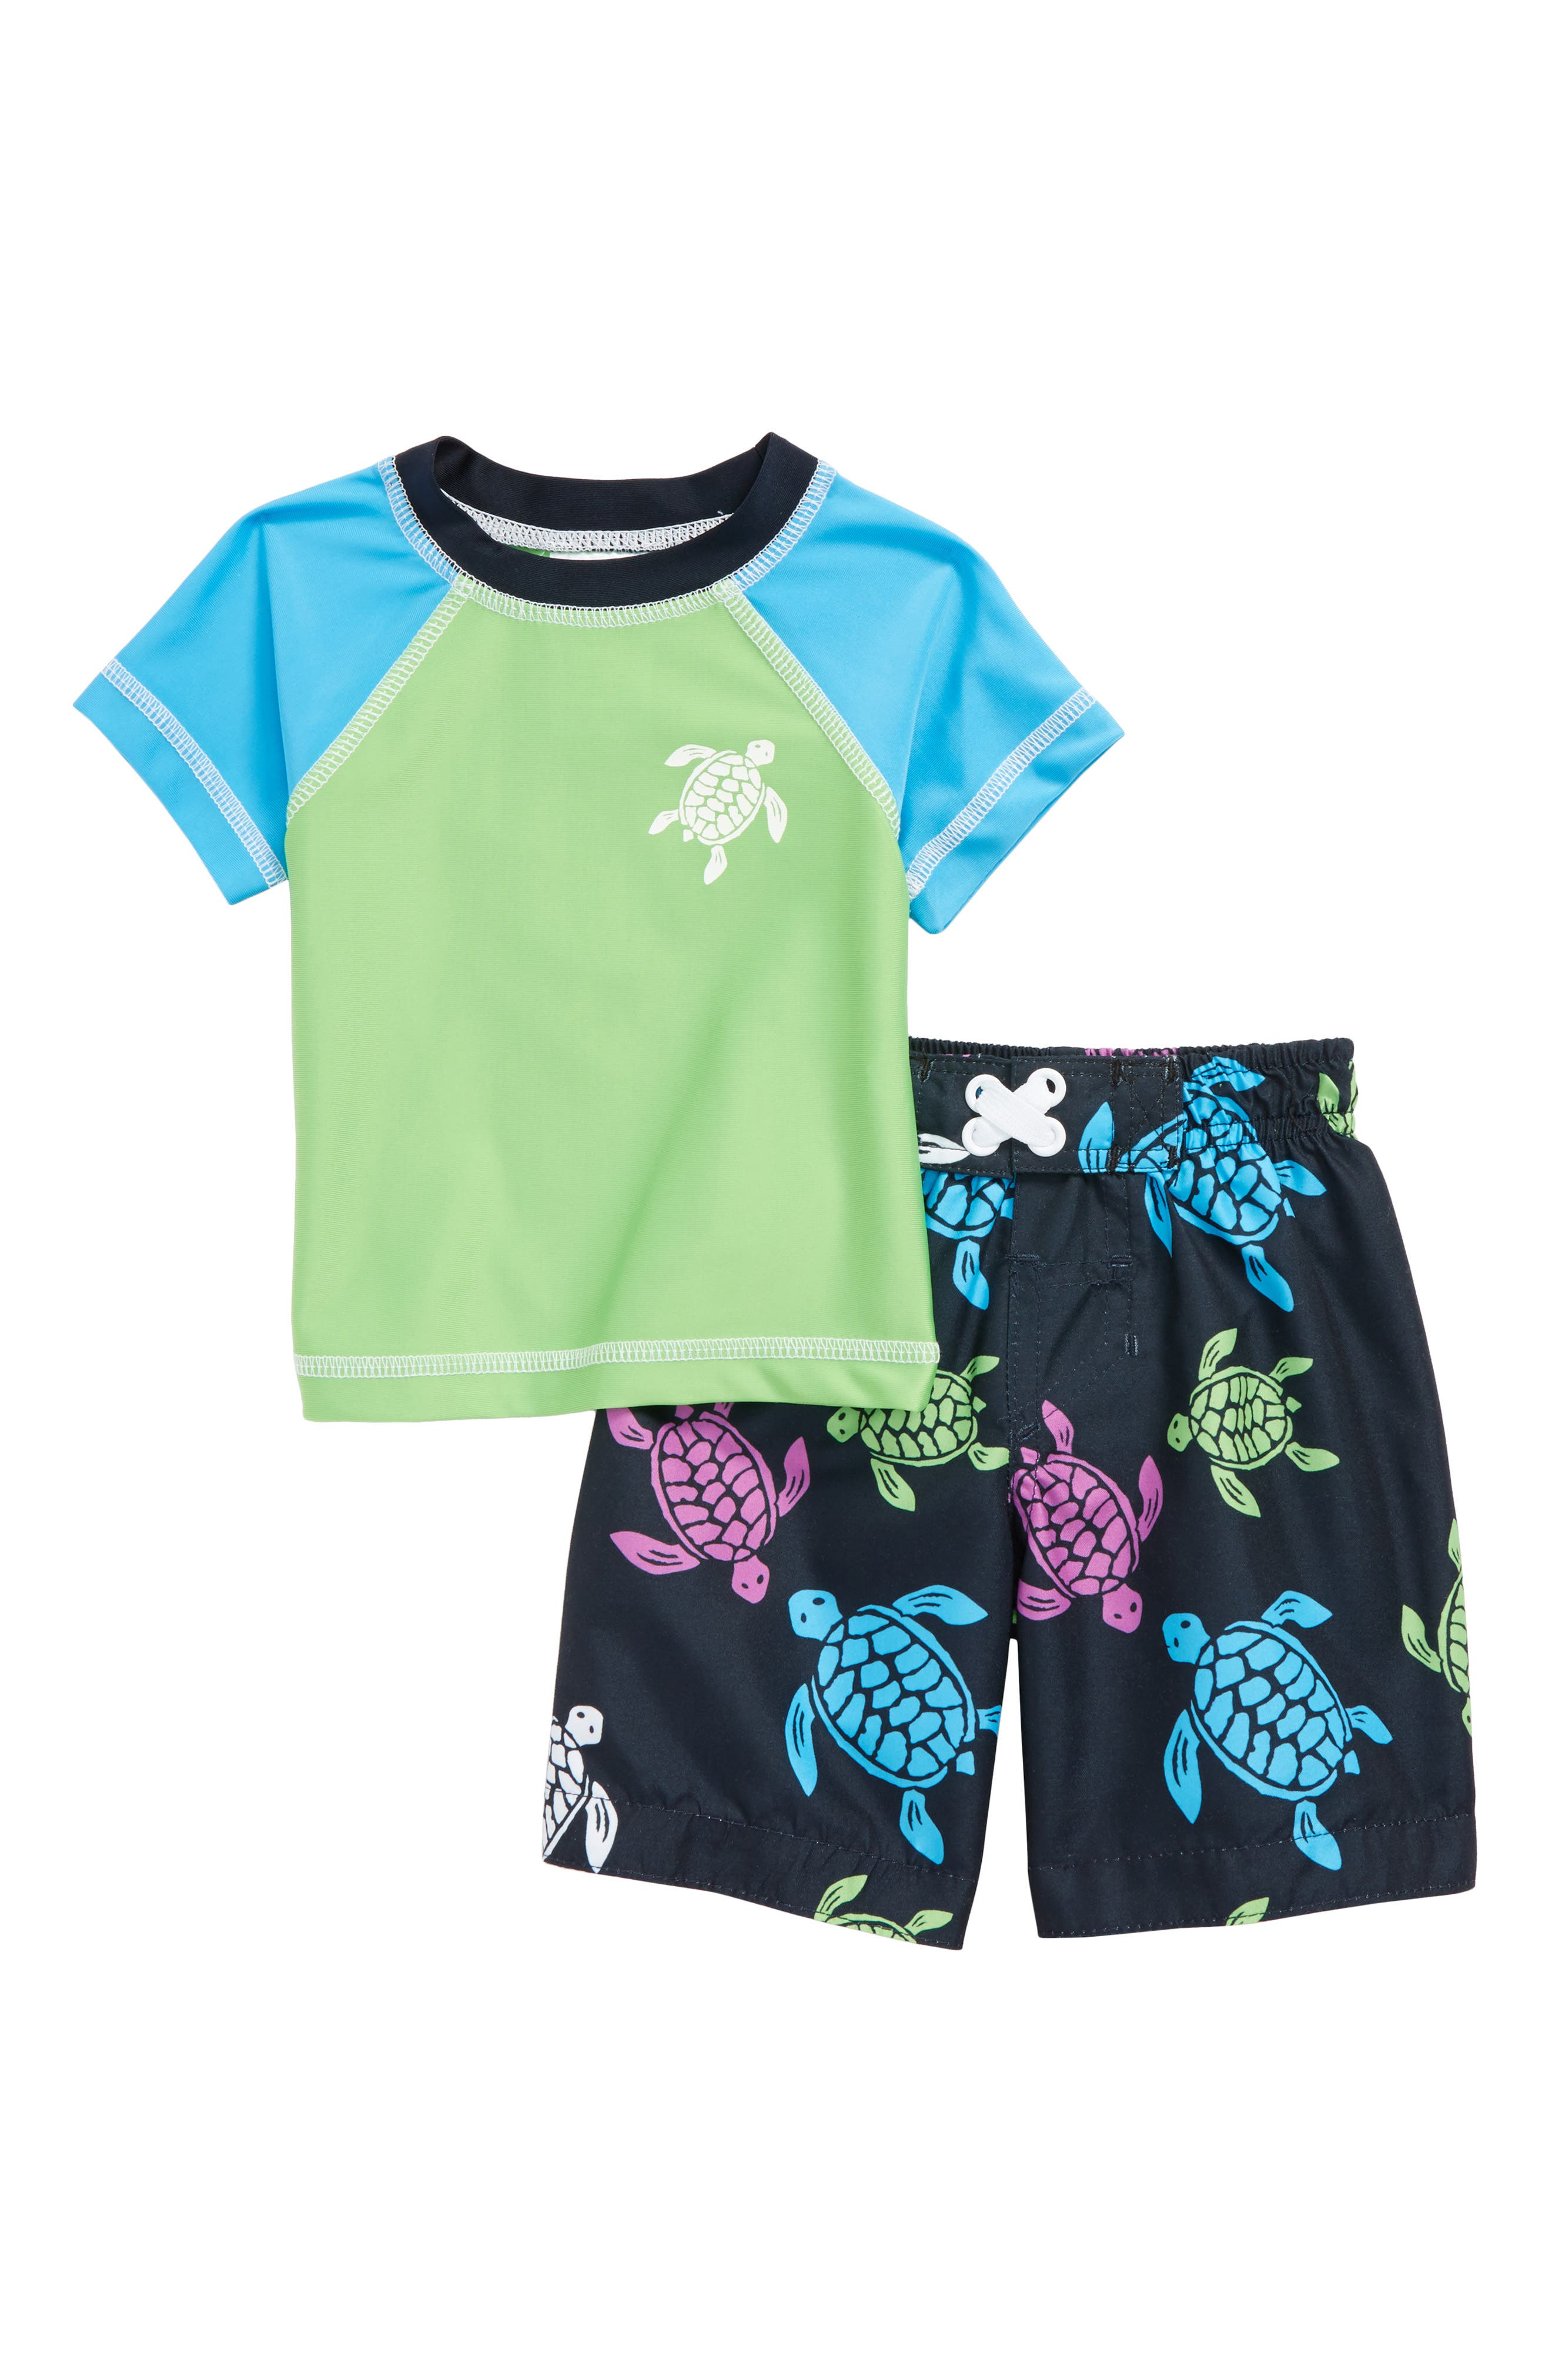 Turtle Two-Piece Rashguard Swimsuit,                             Main thumbnail 1, color,                             399